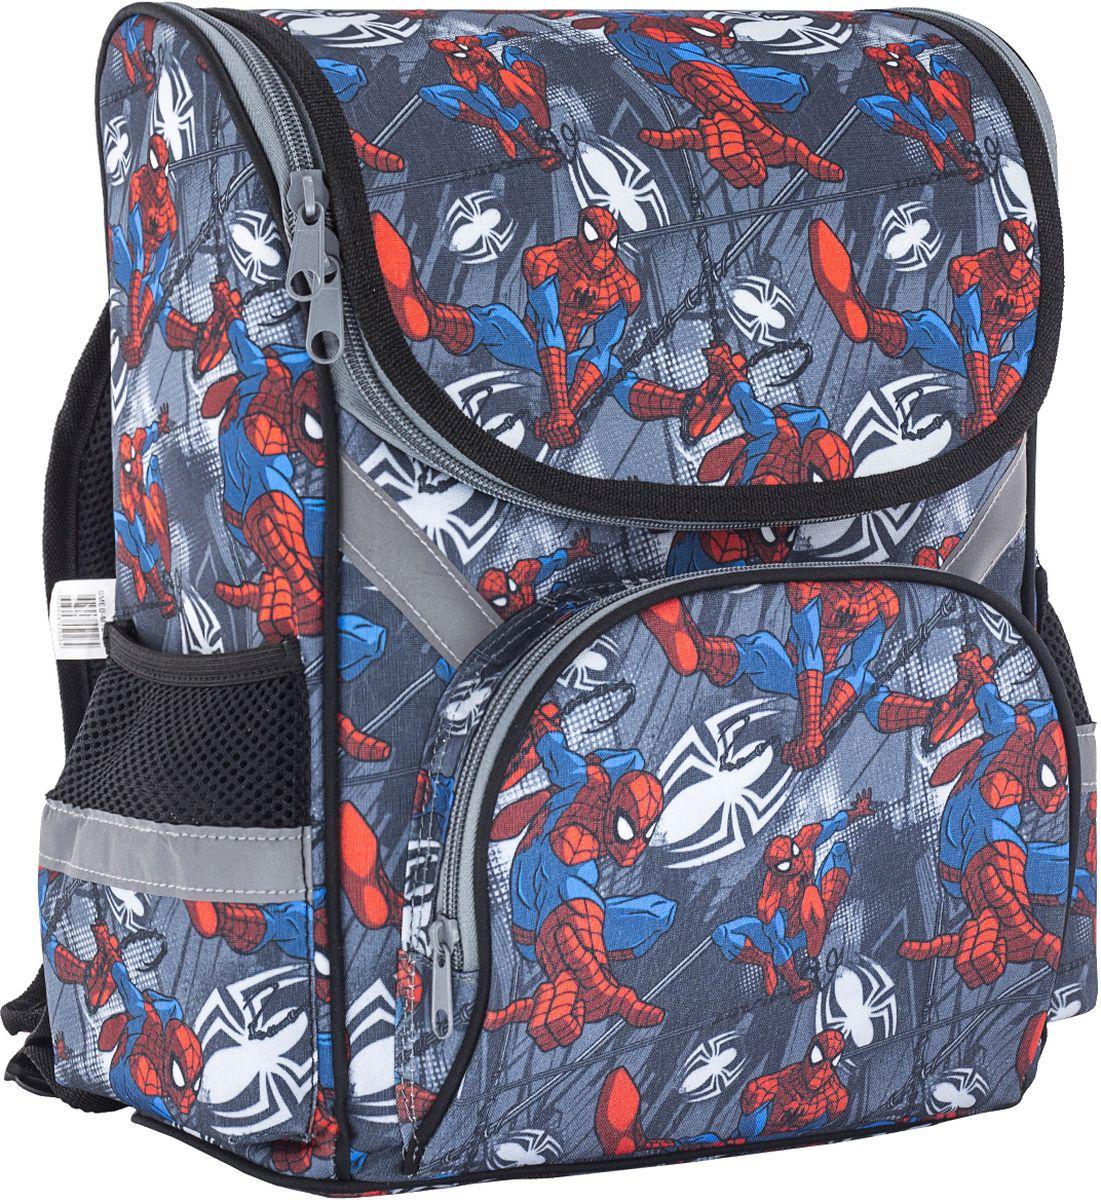 Spider-man Classic Ранец школьный SMEB-MT2-131 ранцы spider man classic ранец трансформер профилактический с eva спинкой spider man classic